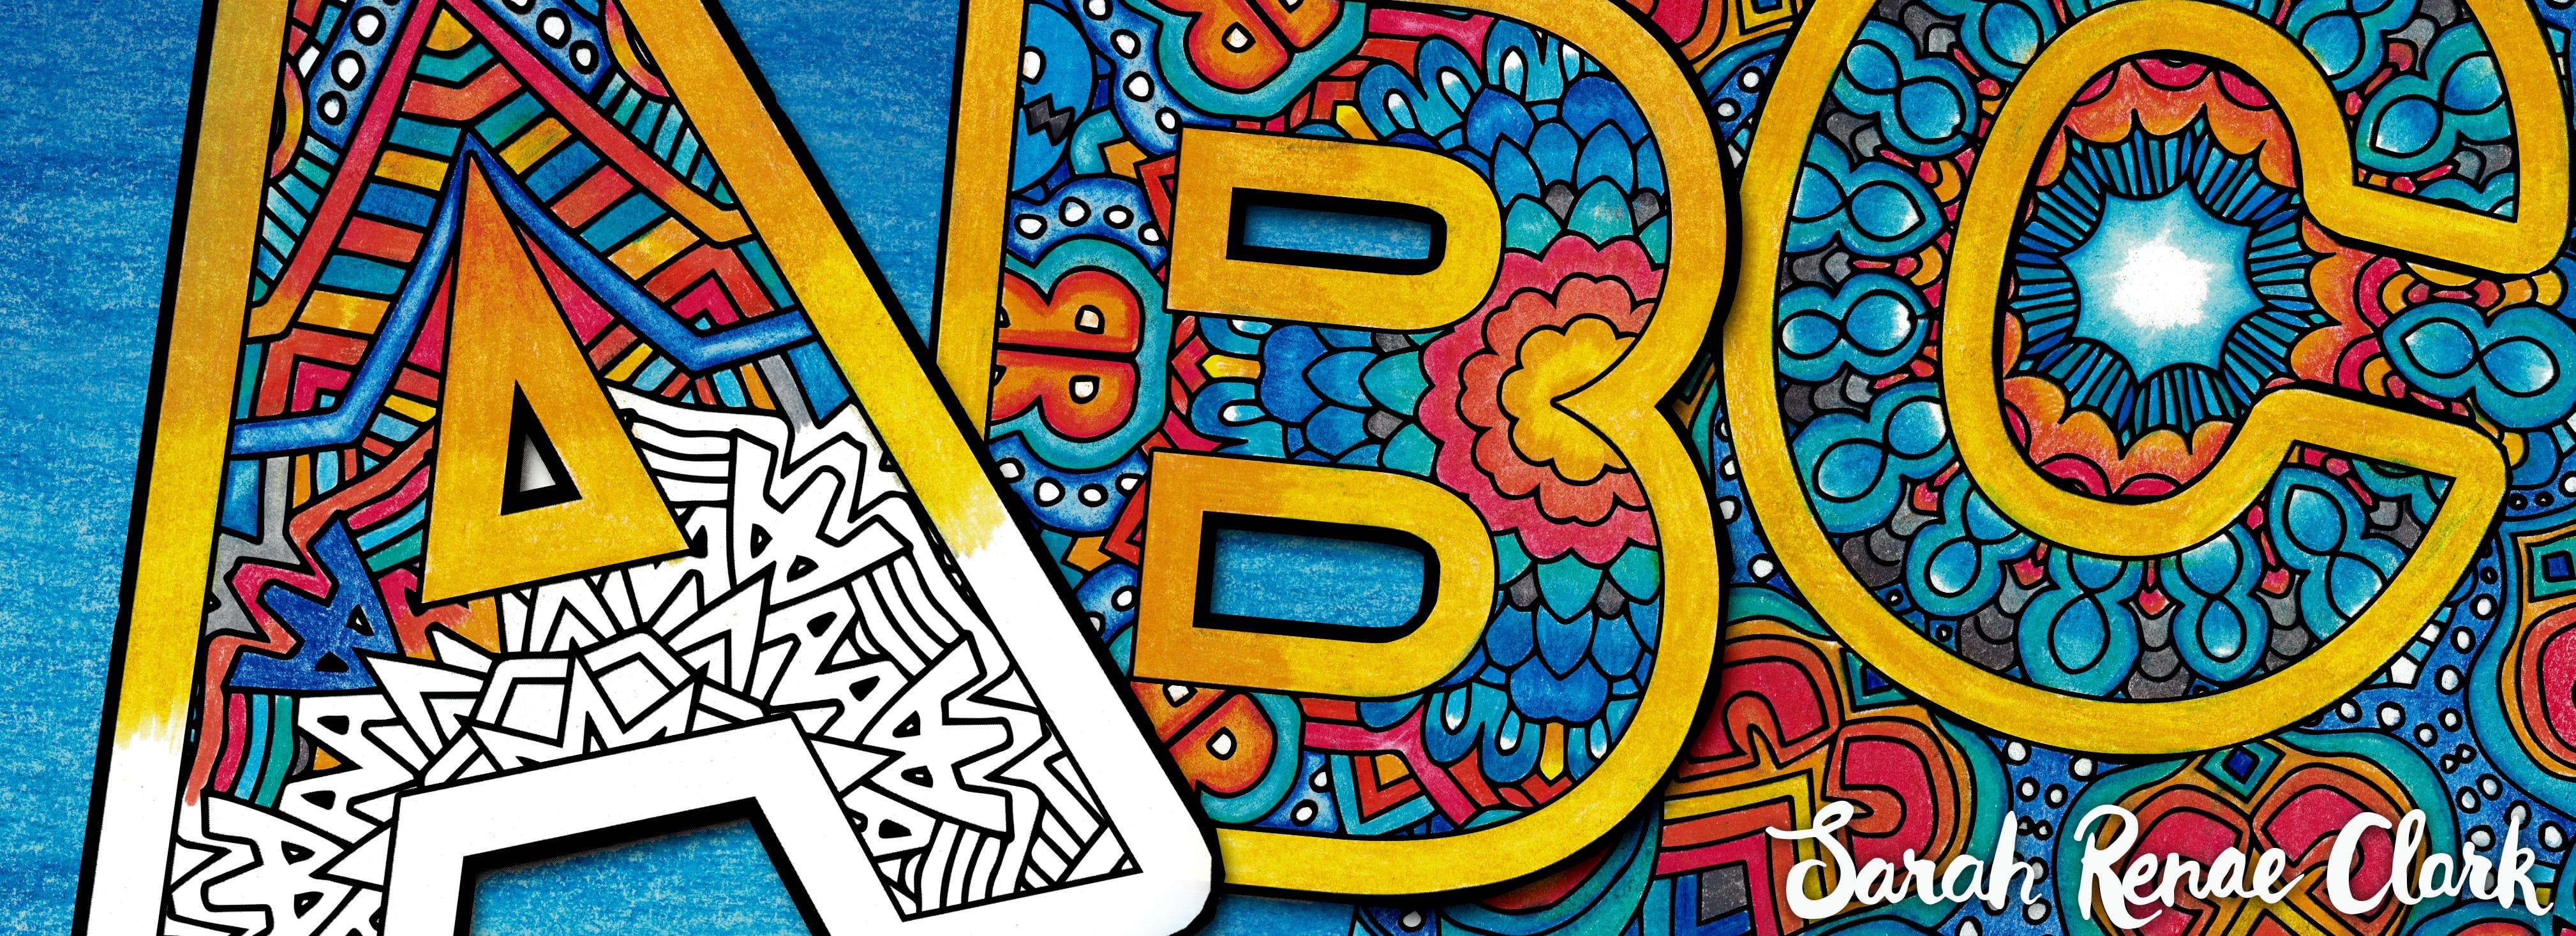 Color the Alphabet: A-Z Adult Coloring Book